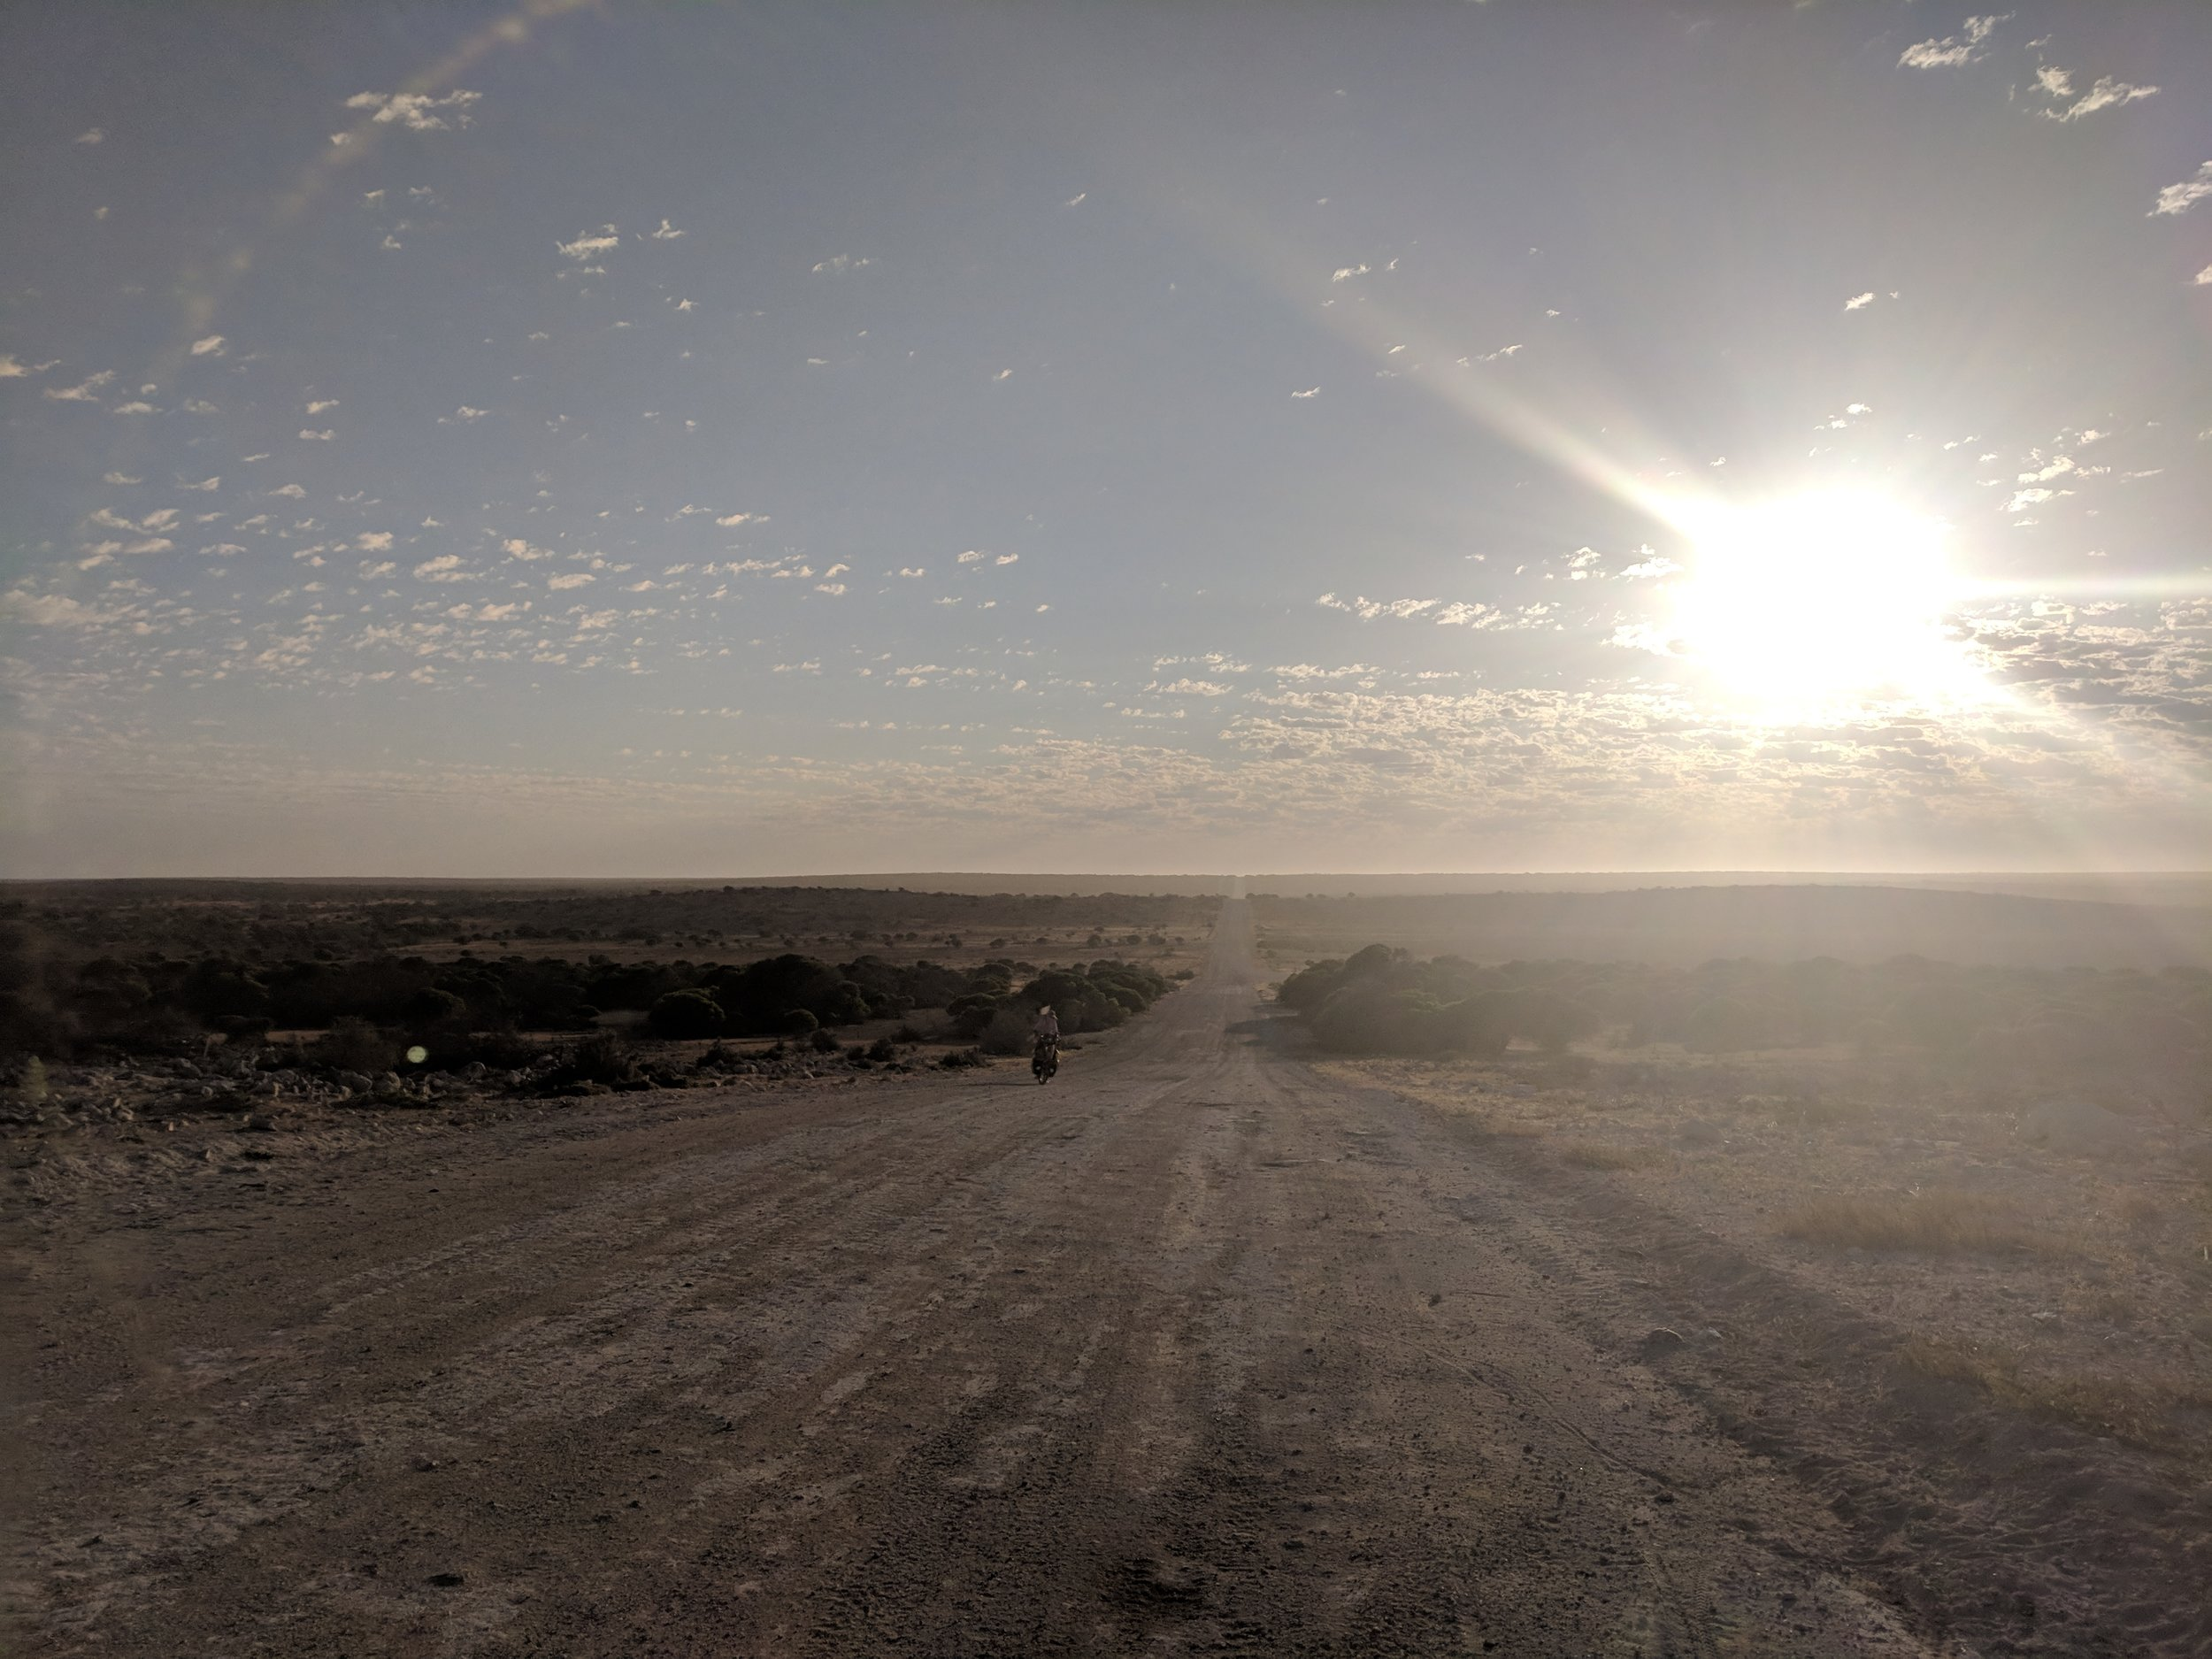 Early mornings heading west towards Useless Loop